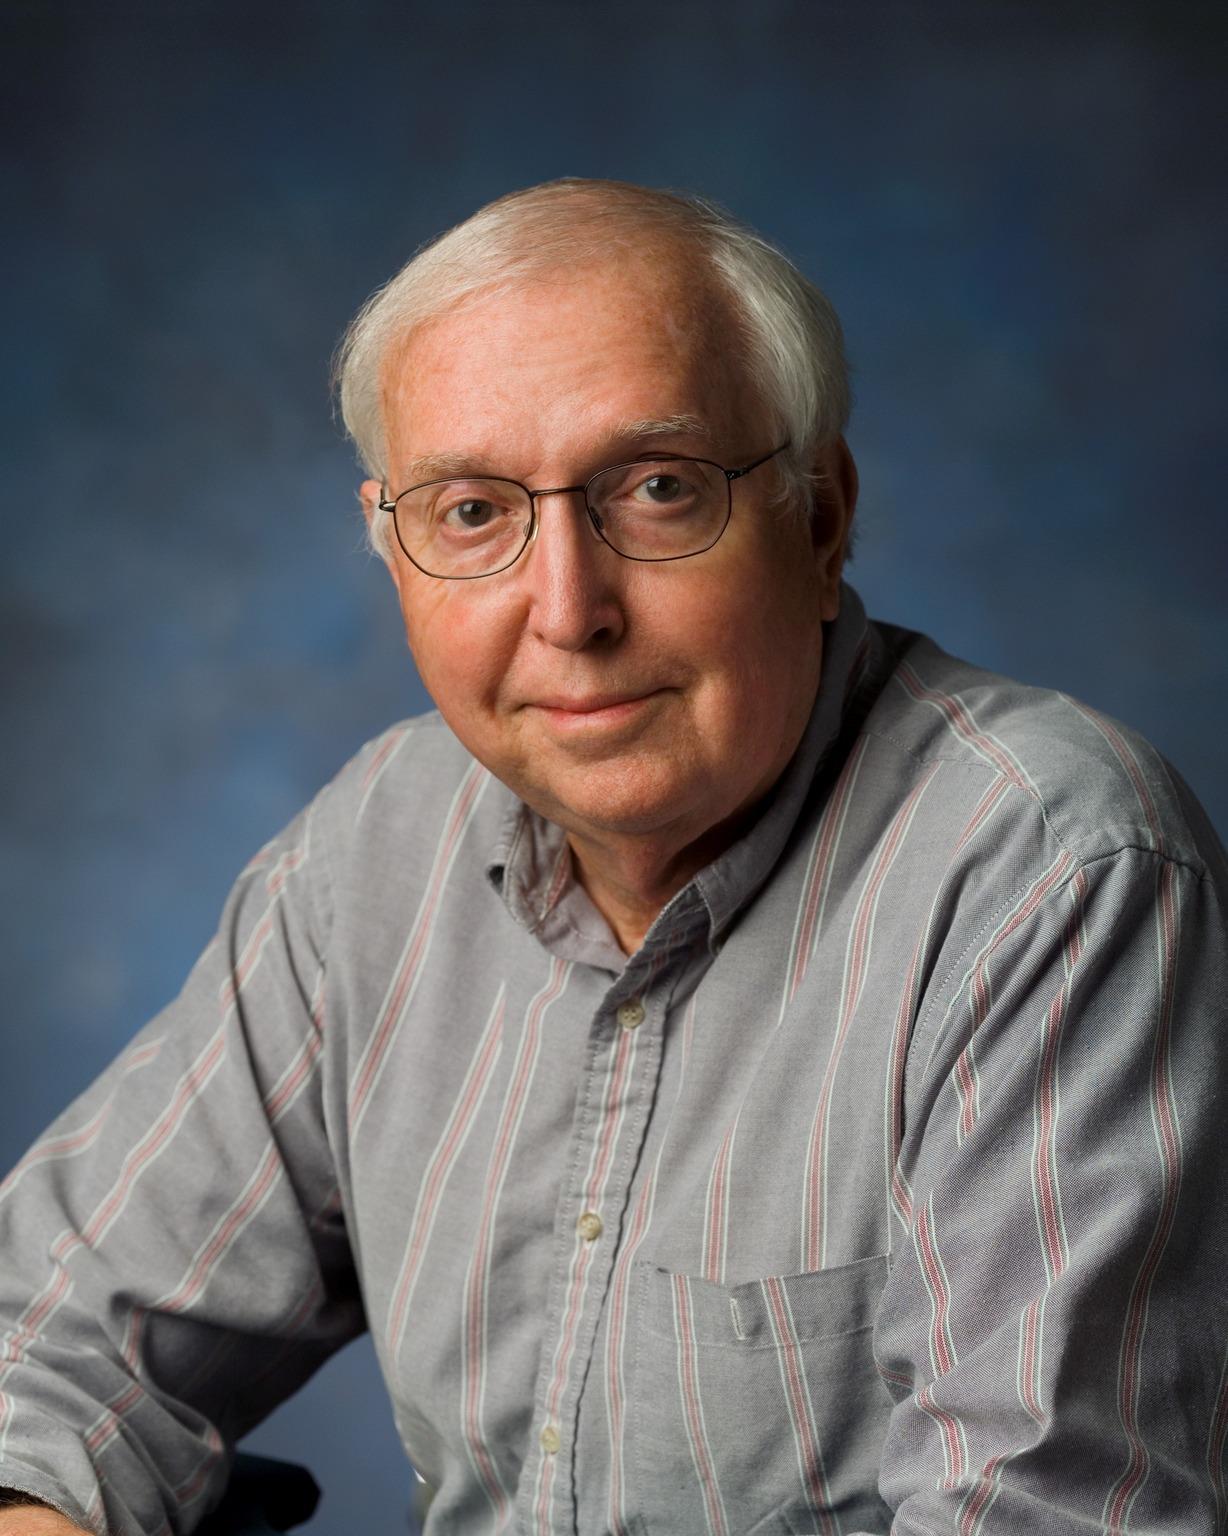 Moon and Mars Exploration Pioneer David McKay Dies at 76